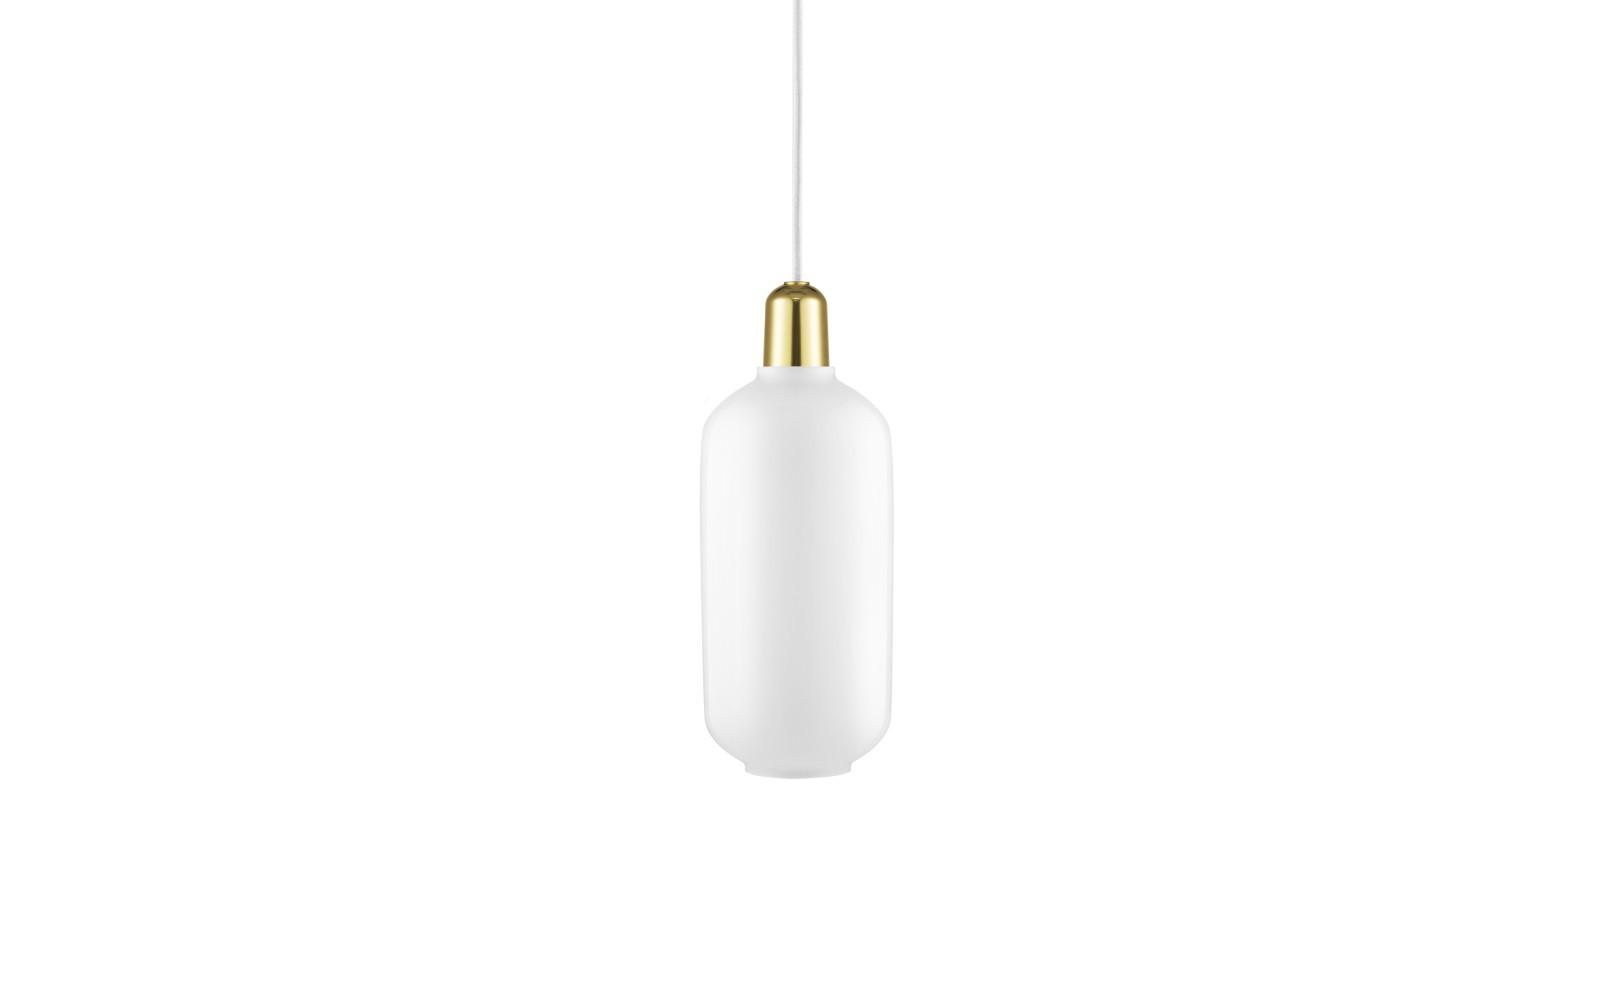 Amp Pendant Light White/Brass, Large